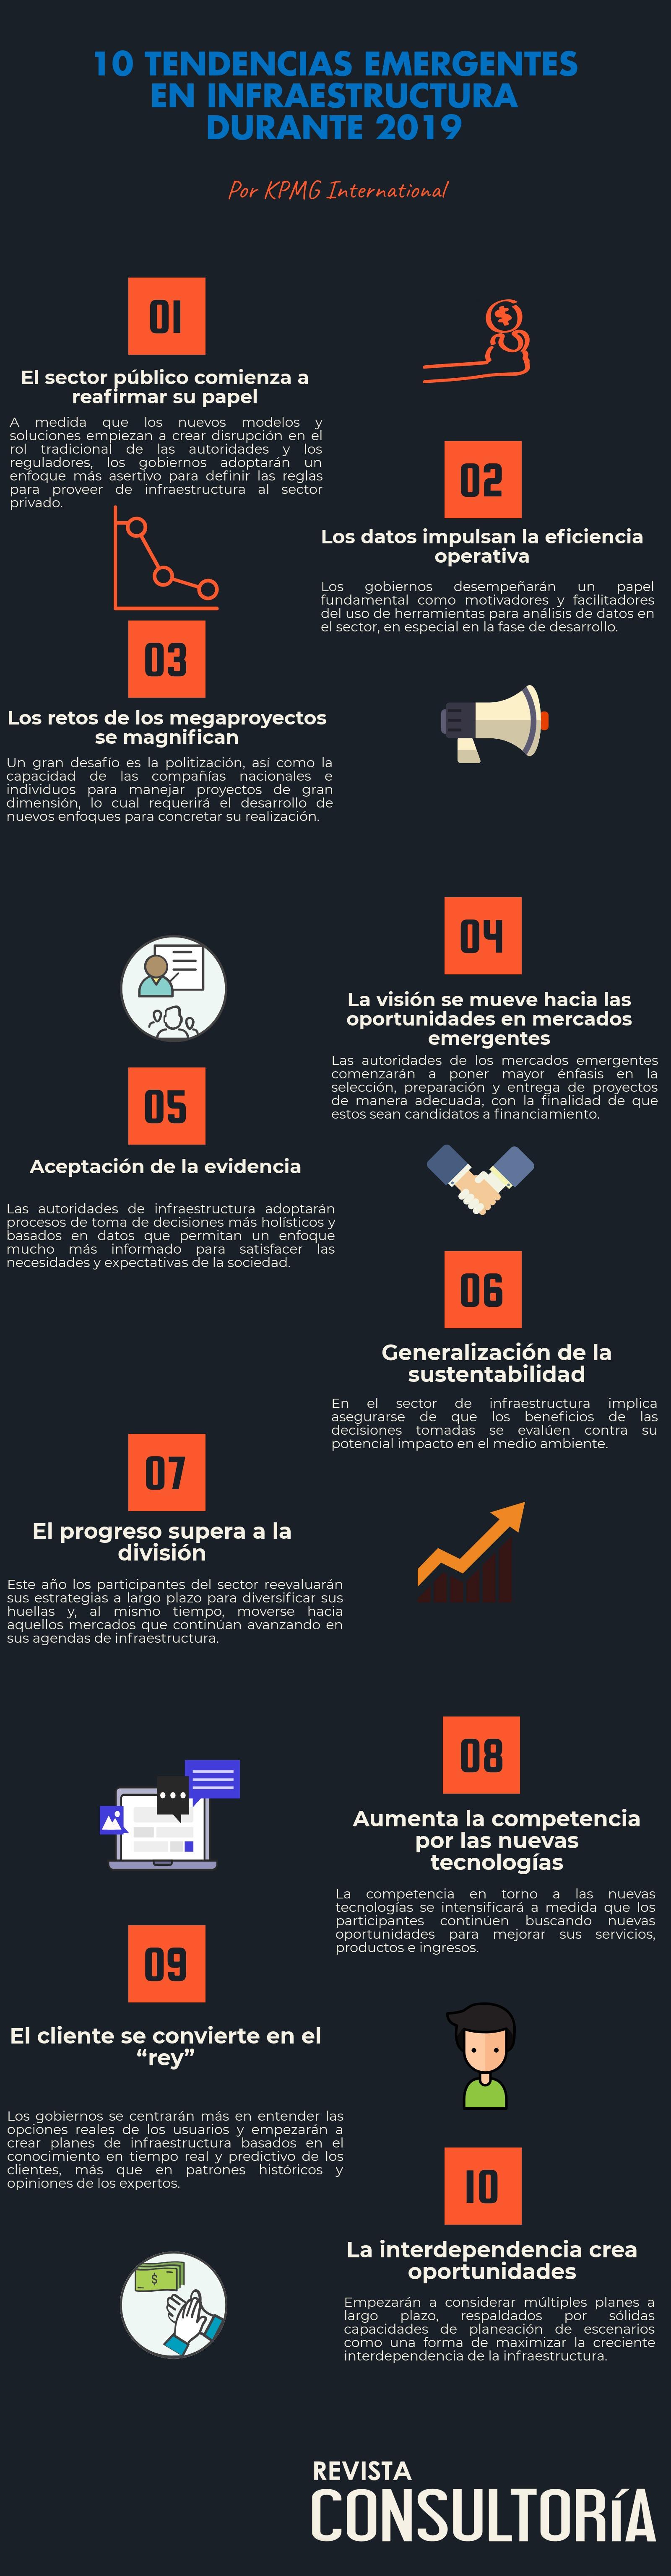 infografia completa1 - 10 TENDENCIAS EMERGENTES EN INFRAESTRUCTURA DURANTE 2019